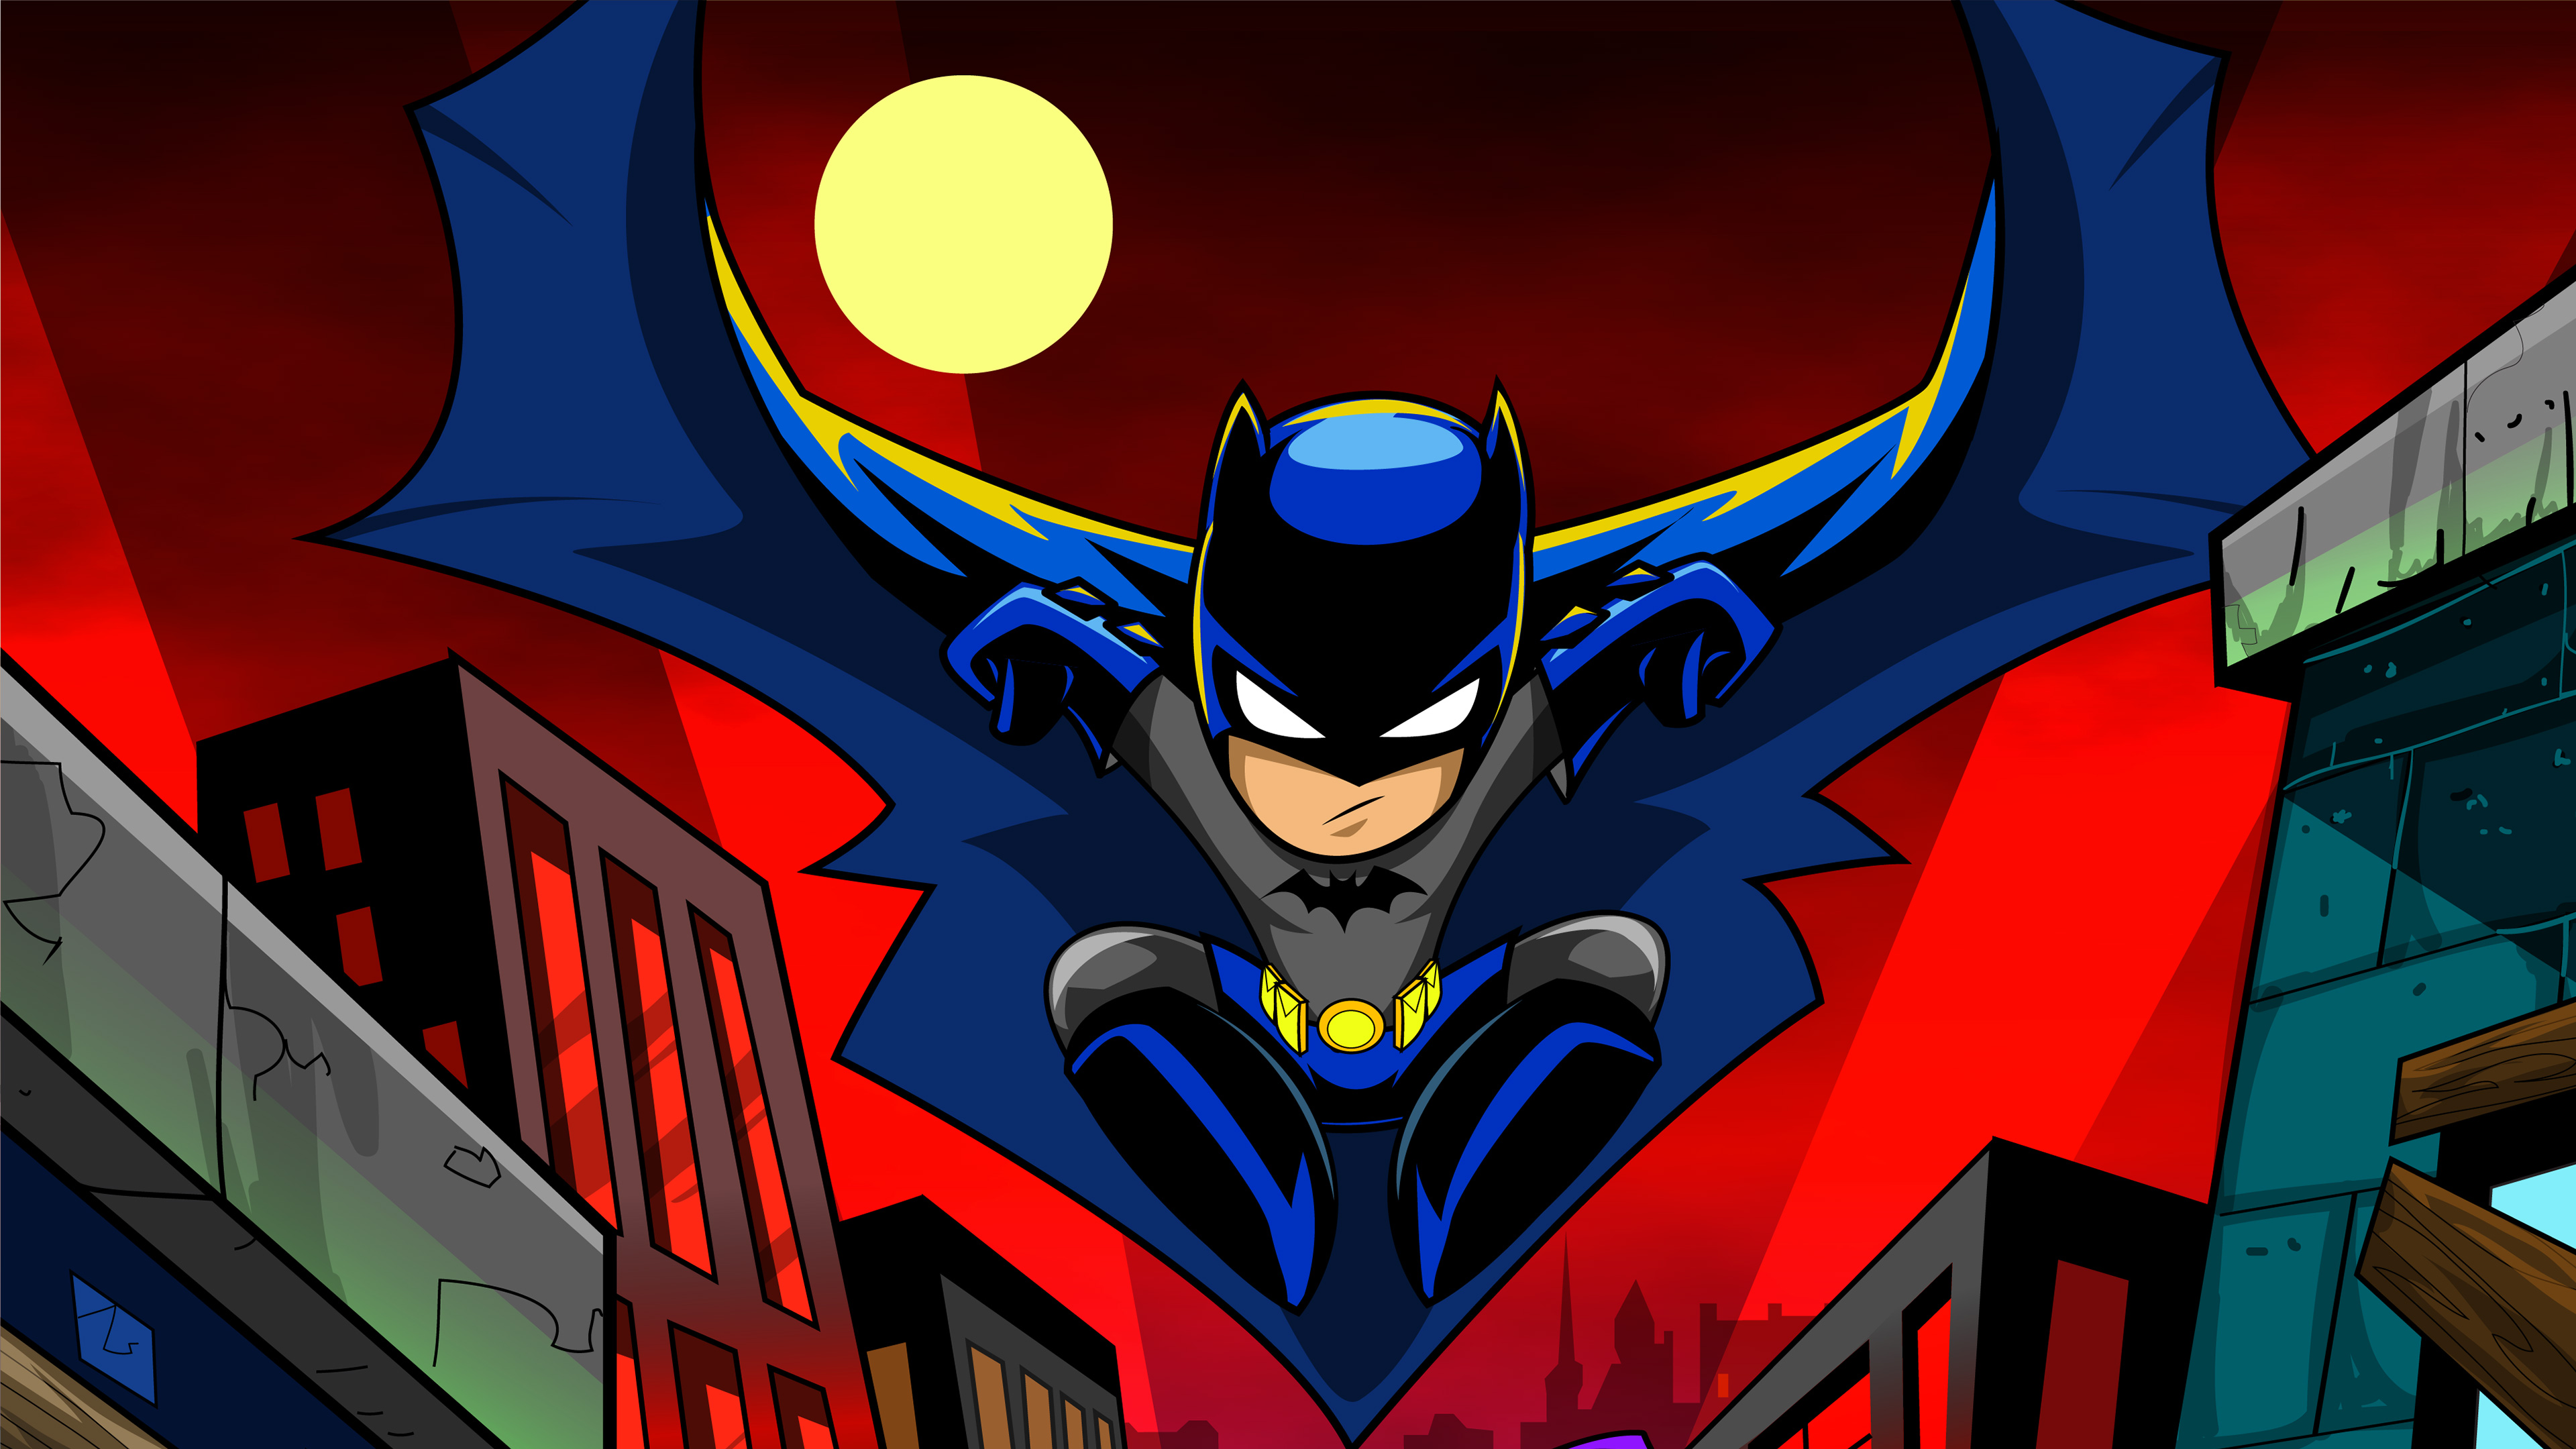 Batman Cartoon Art 4k Hd Superheroes 4k Wallpapers Images